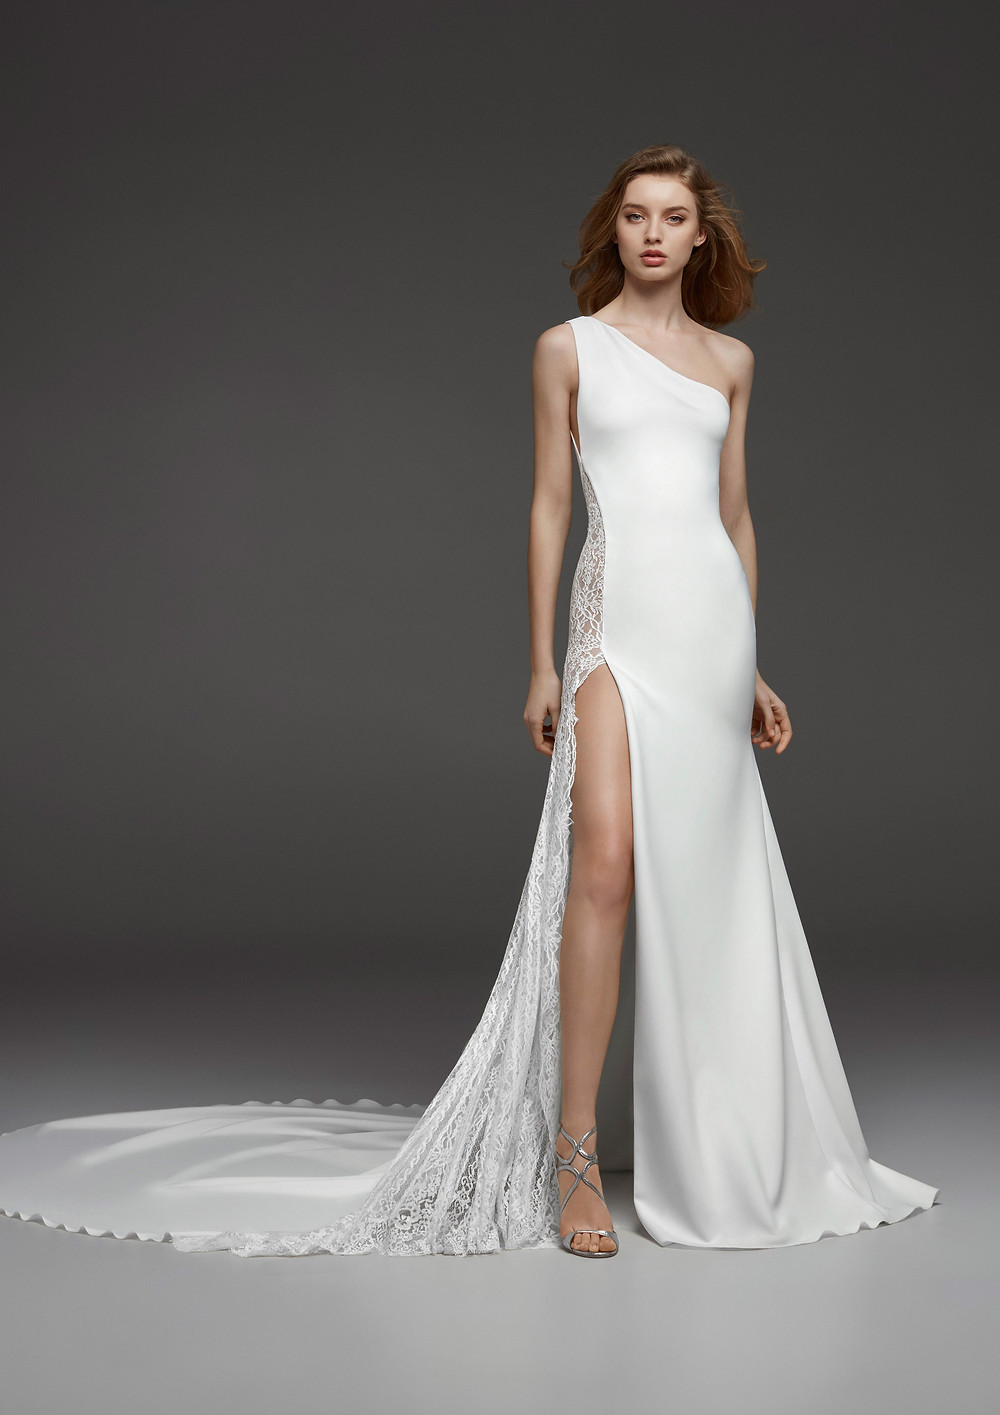 A Pronovias one shoulder, sheath wedding dress, with lace insert